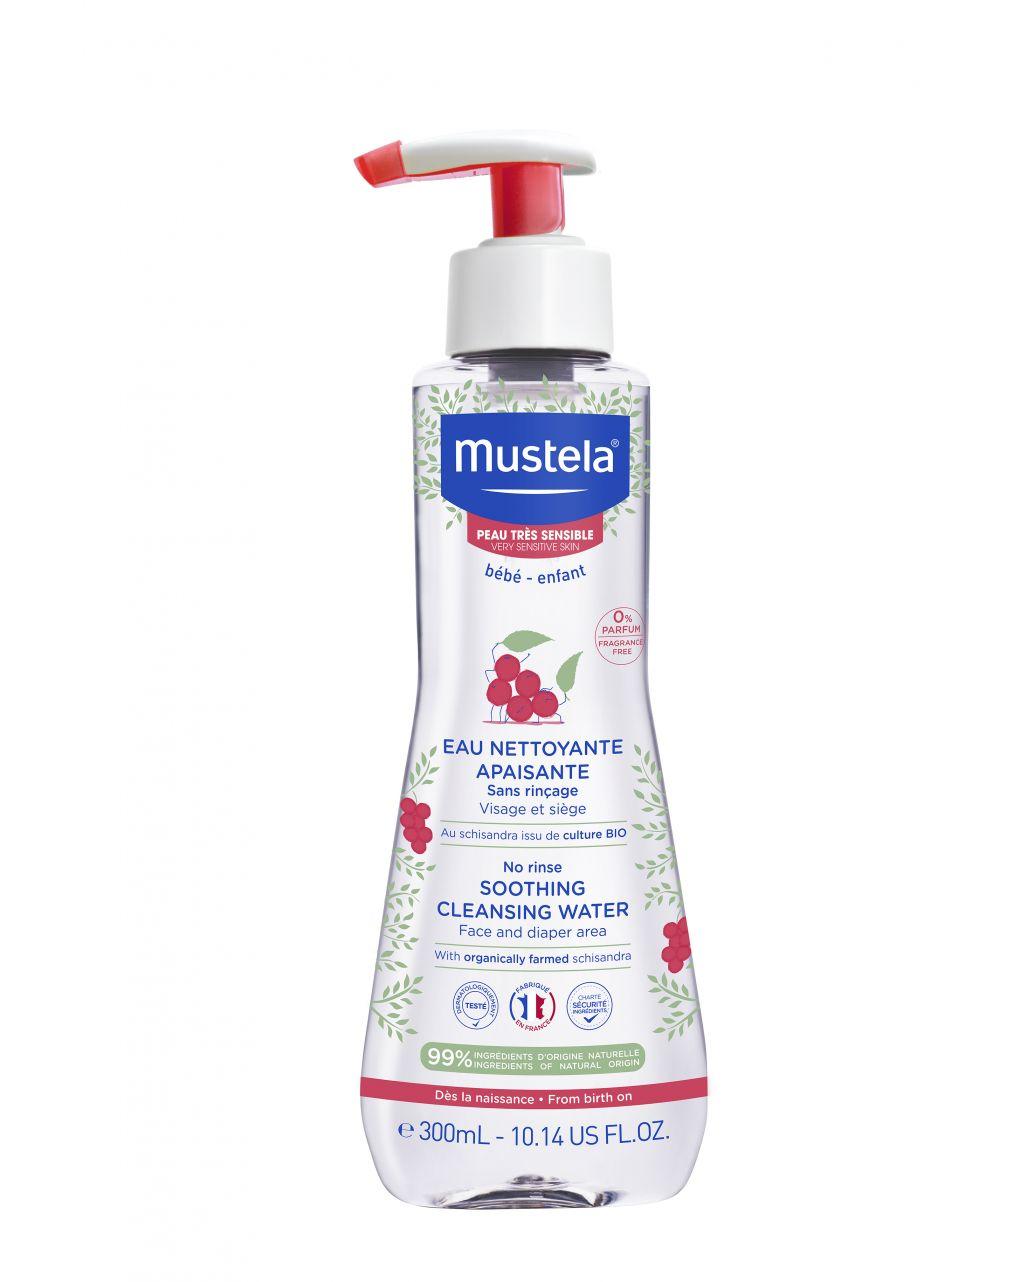 Fluido detergente s/r 300ml - Mustela